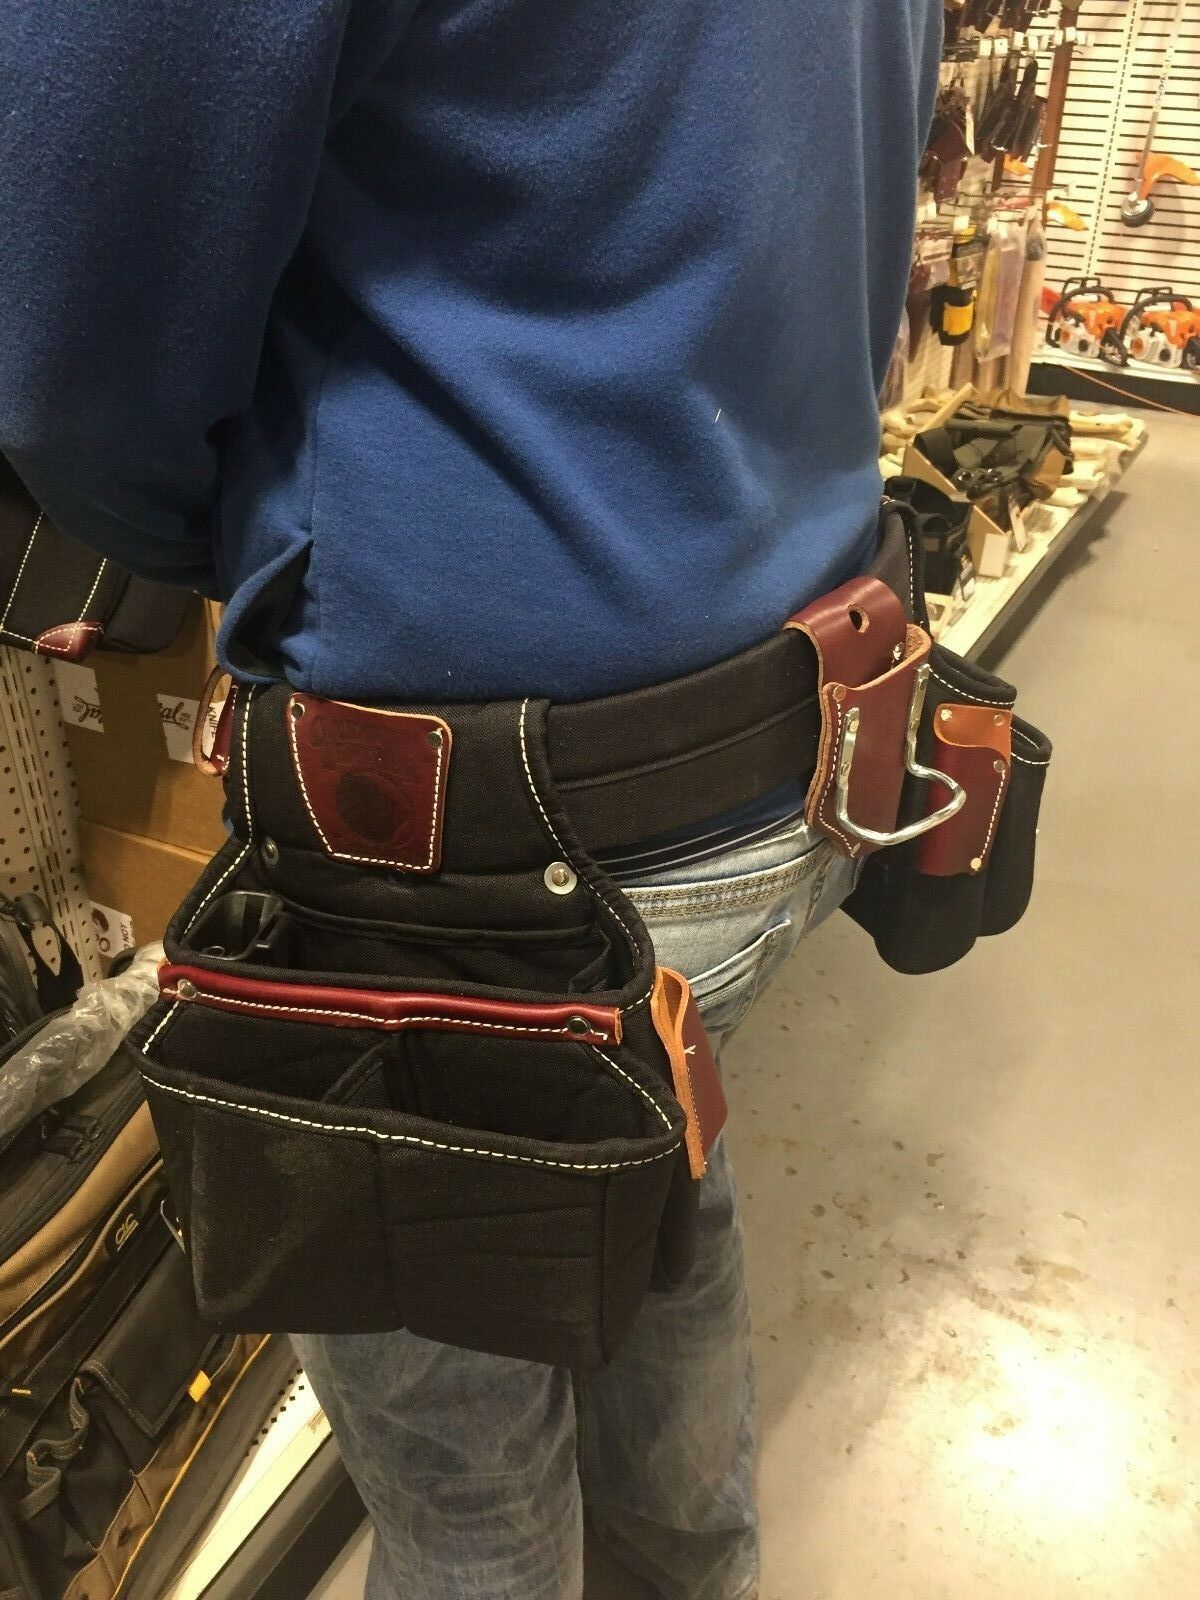 Occidental Leather 9525 (Size Medium) Finisher Tool Bag Belt Set